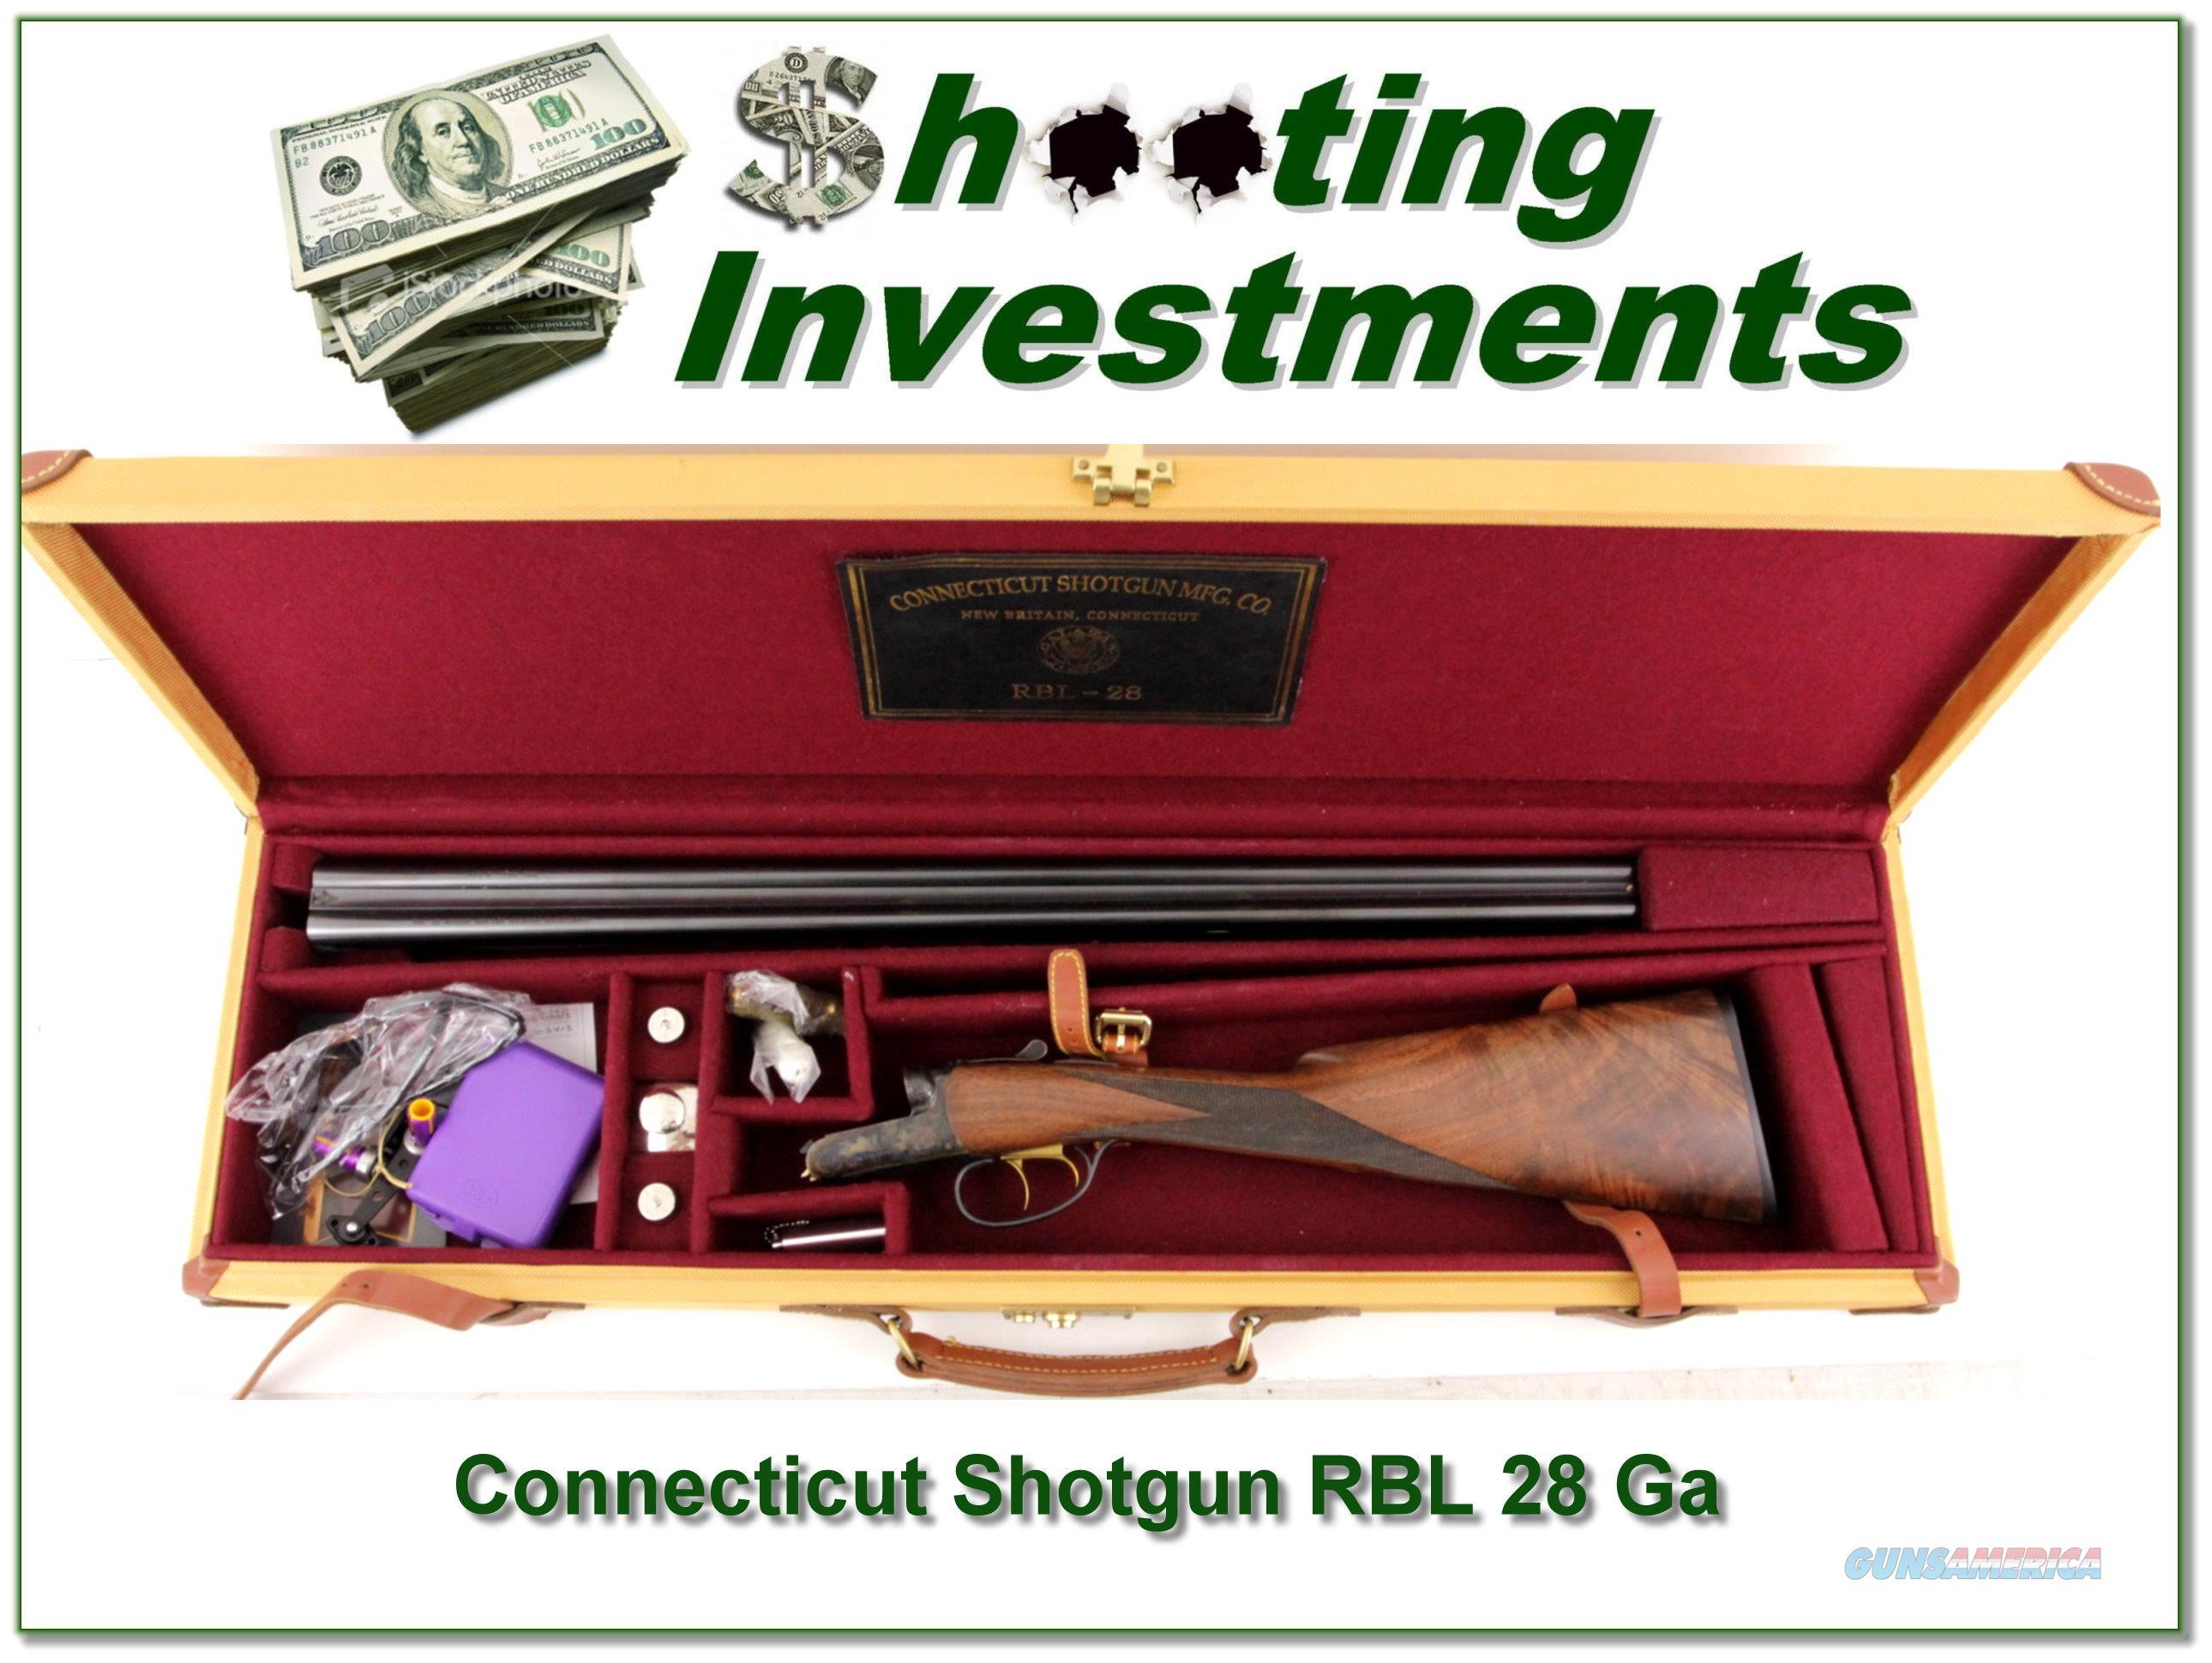 Connecticut Shotgun RBL 28 Ga in case  Guns > Shotguns > Connecticut (Galazan) Shotguns